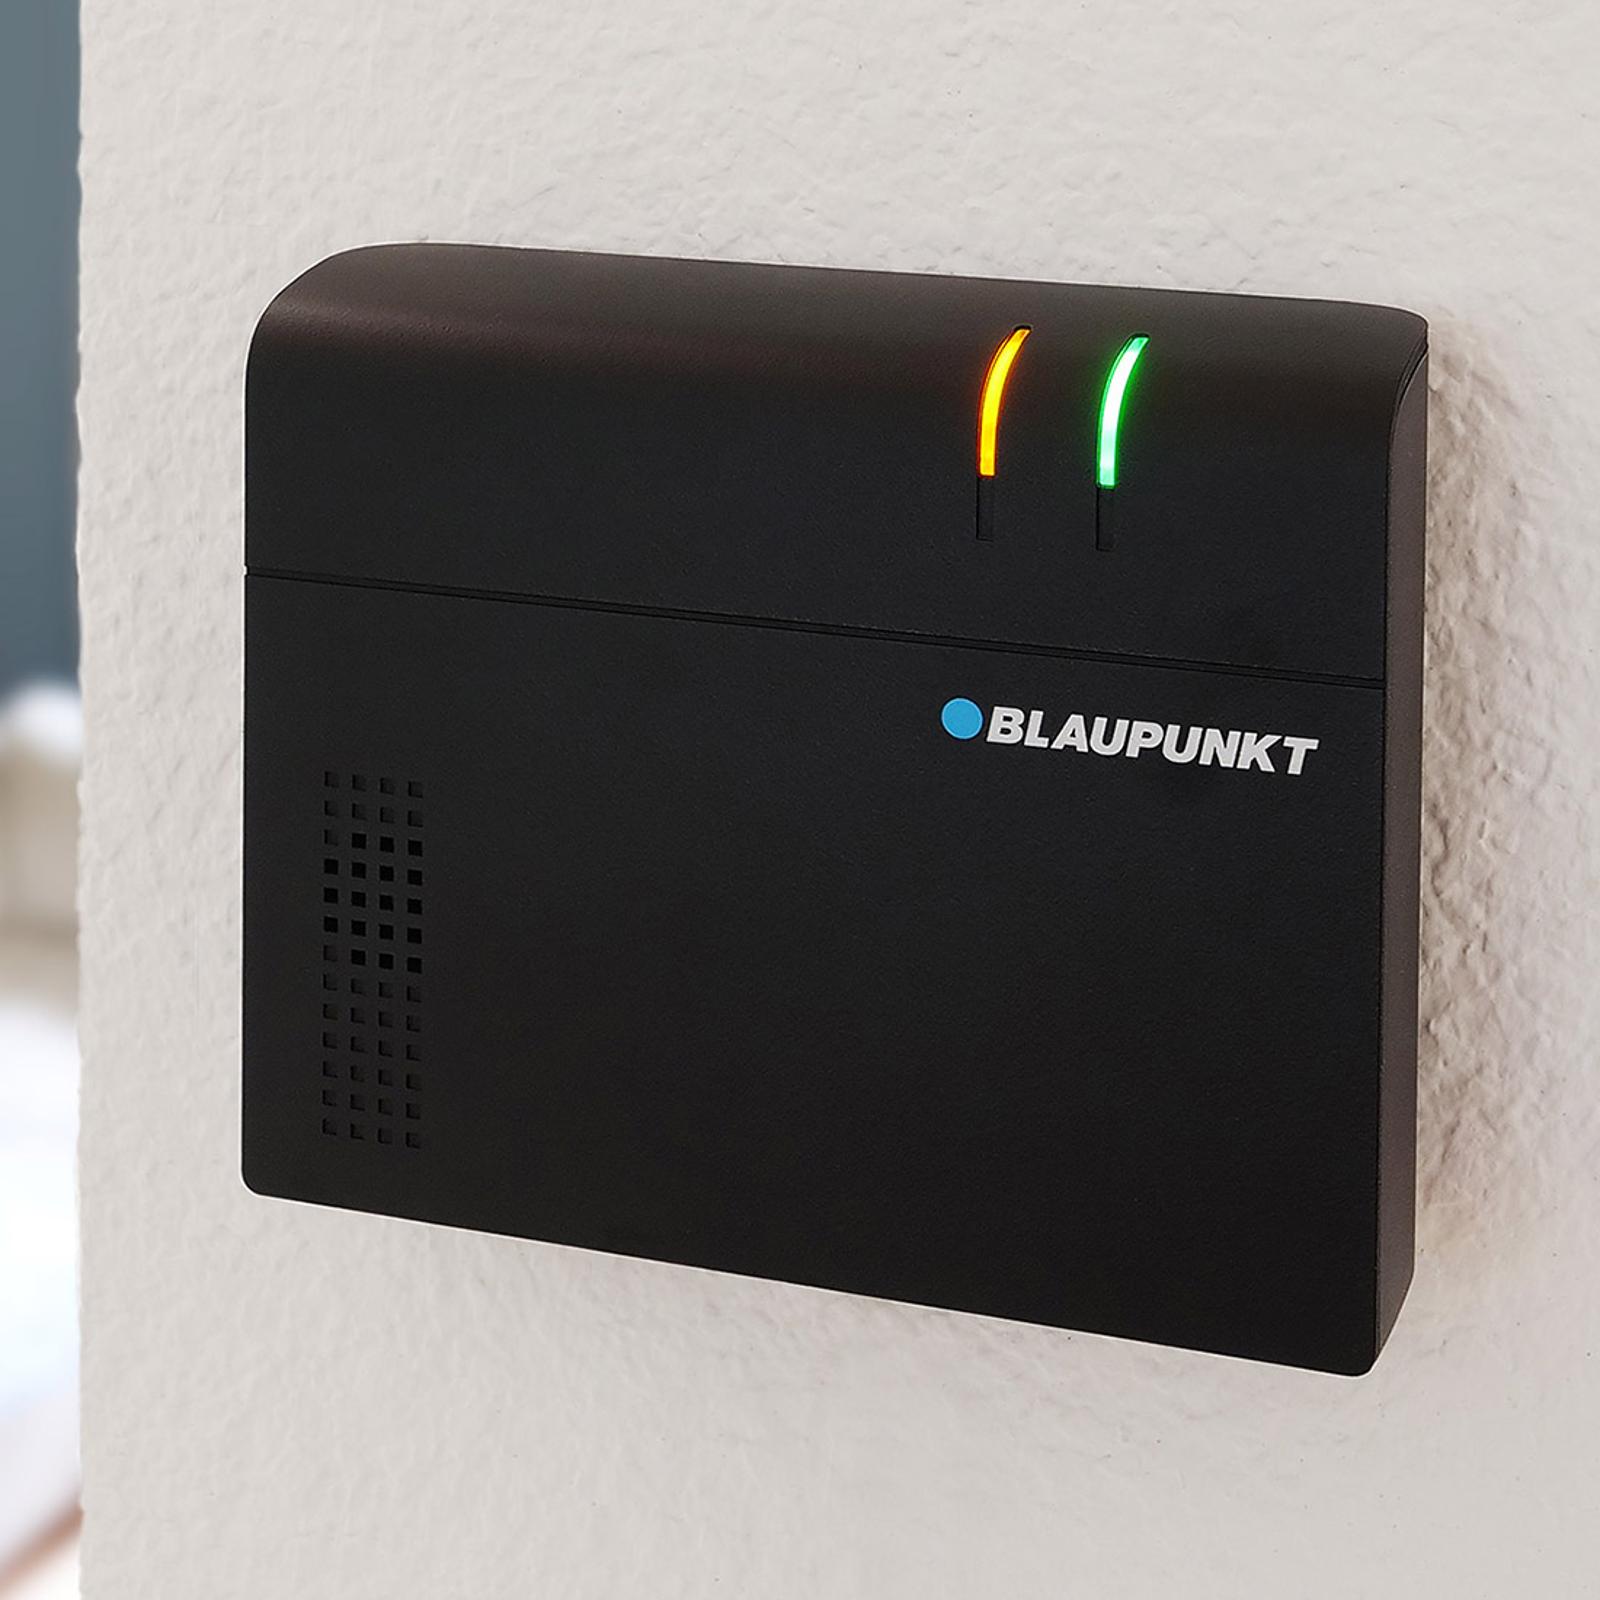 Blaupunkt Q-PRO6300 Smart Home Alarmanlage